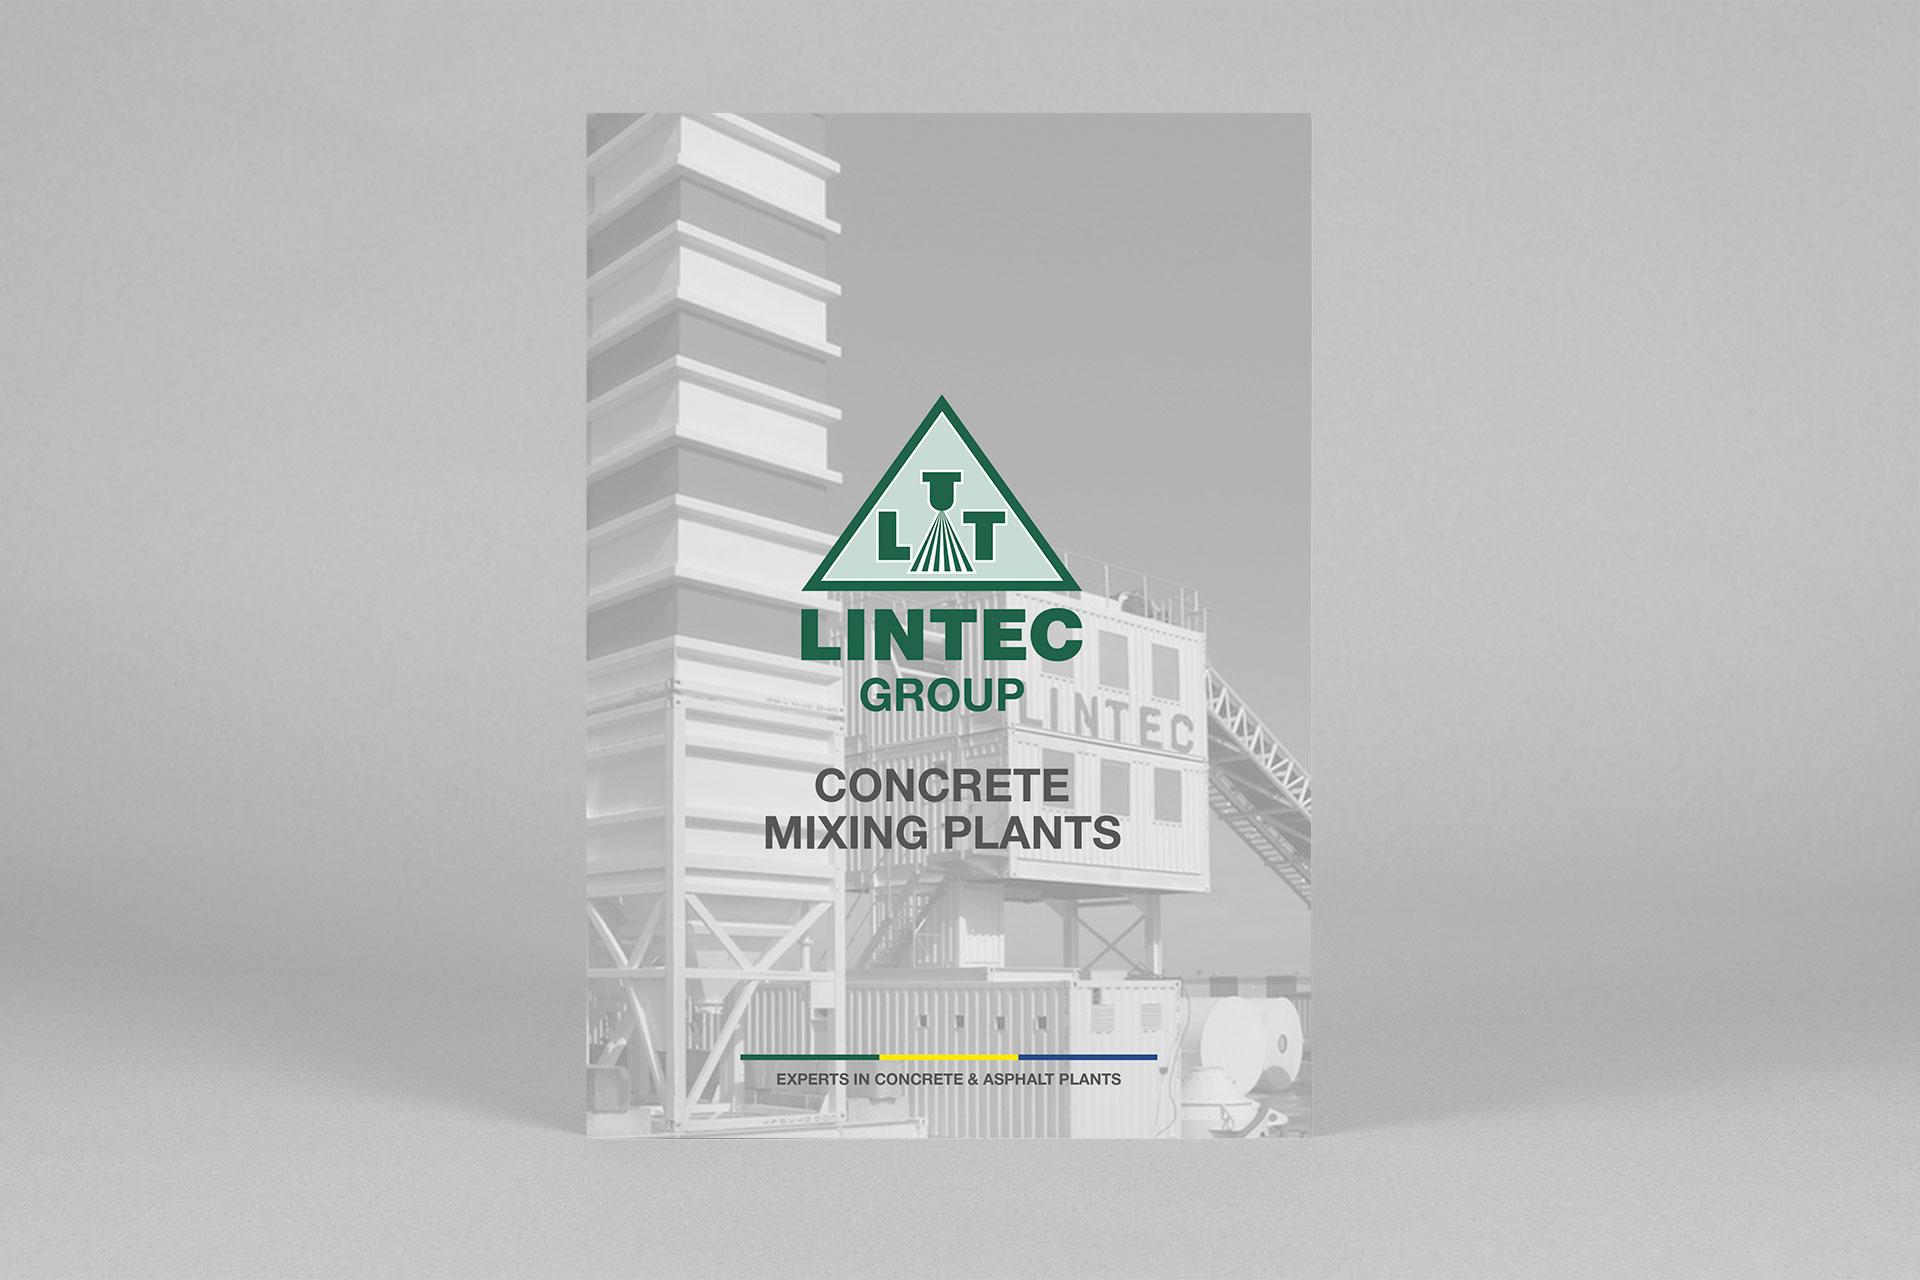 Lintec Group Coverdesign im Corporate Design